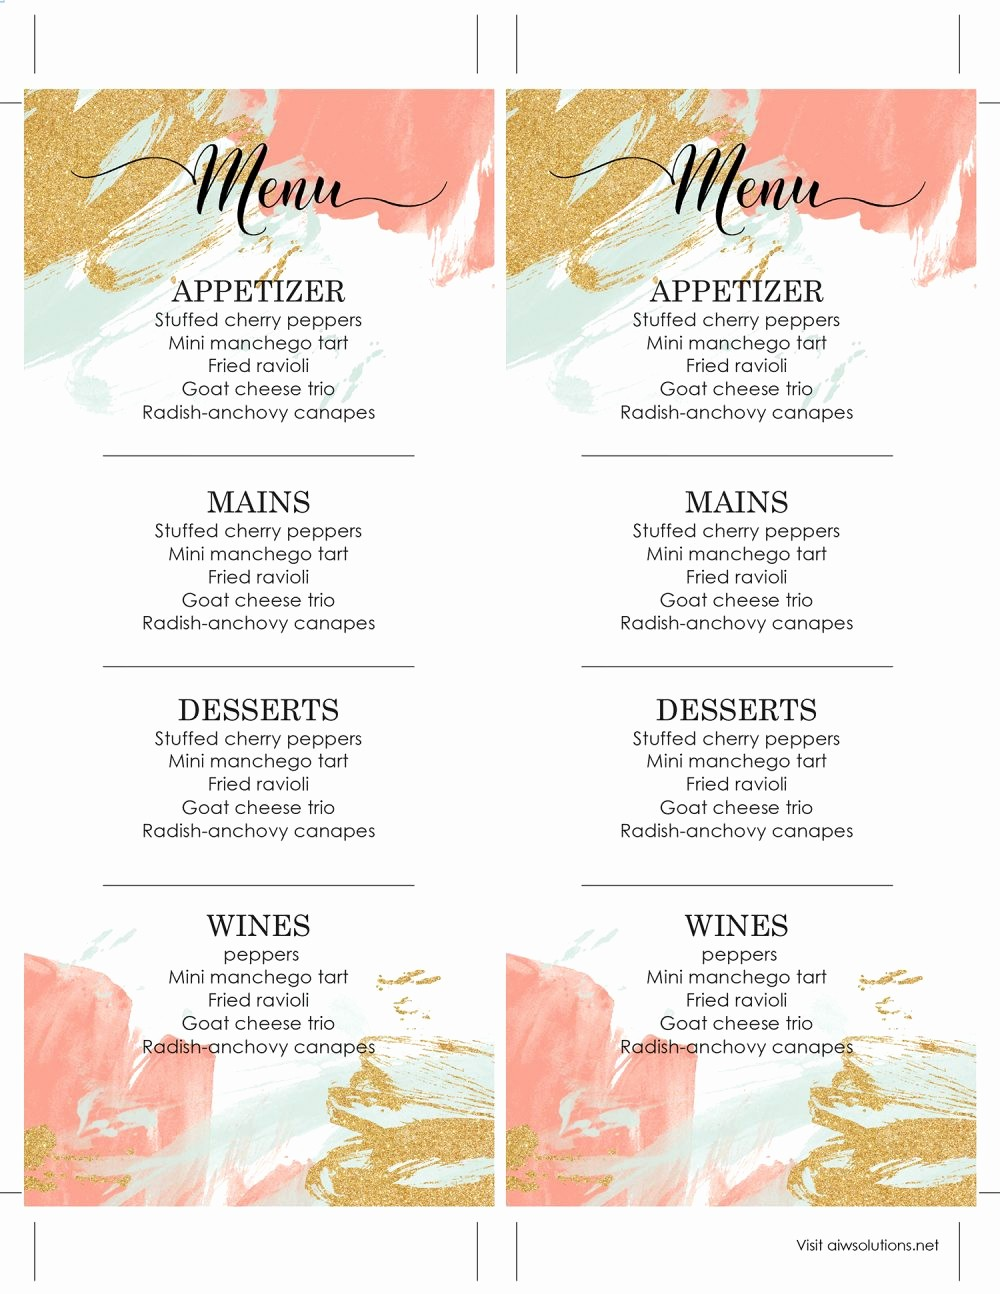 Free Editable Restaurant Menu Templates New Design & Templates Menu Templates Wedding Menu Food